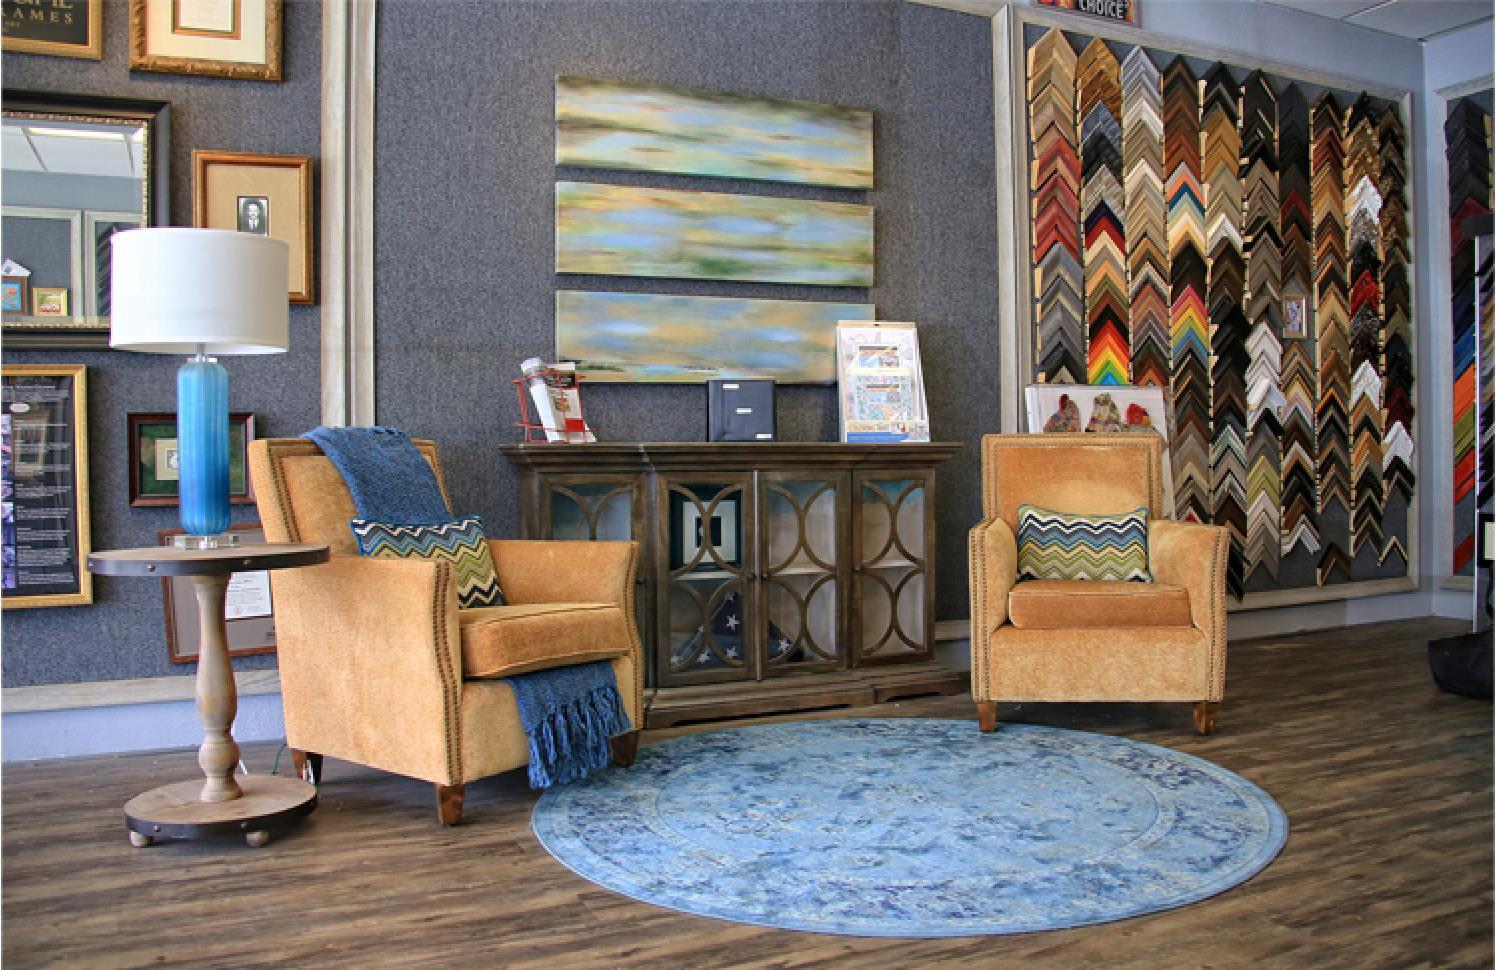 EXPRESS Art and Frame Reviews, Ratings | Arts & Crafts near 3112 E Camelback Rd , Phoenix AZ